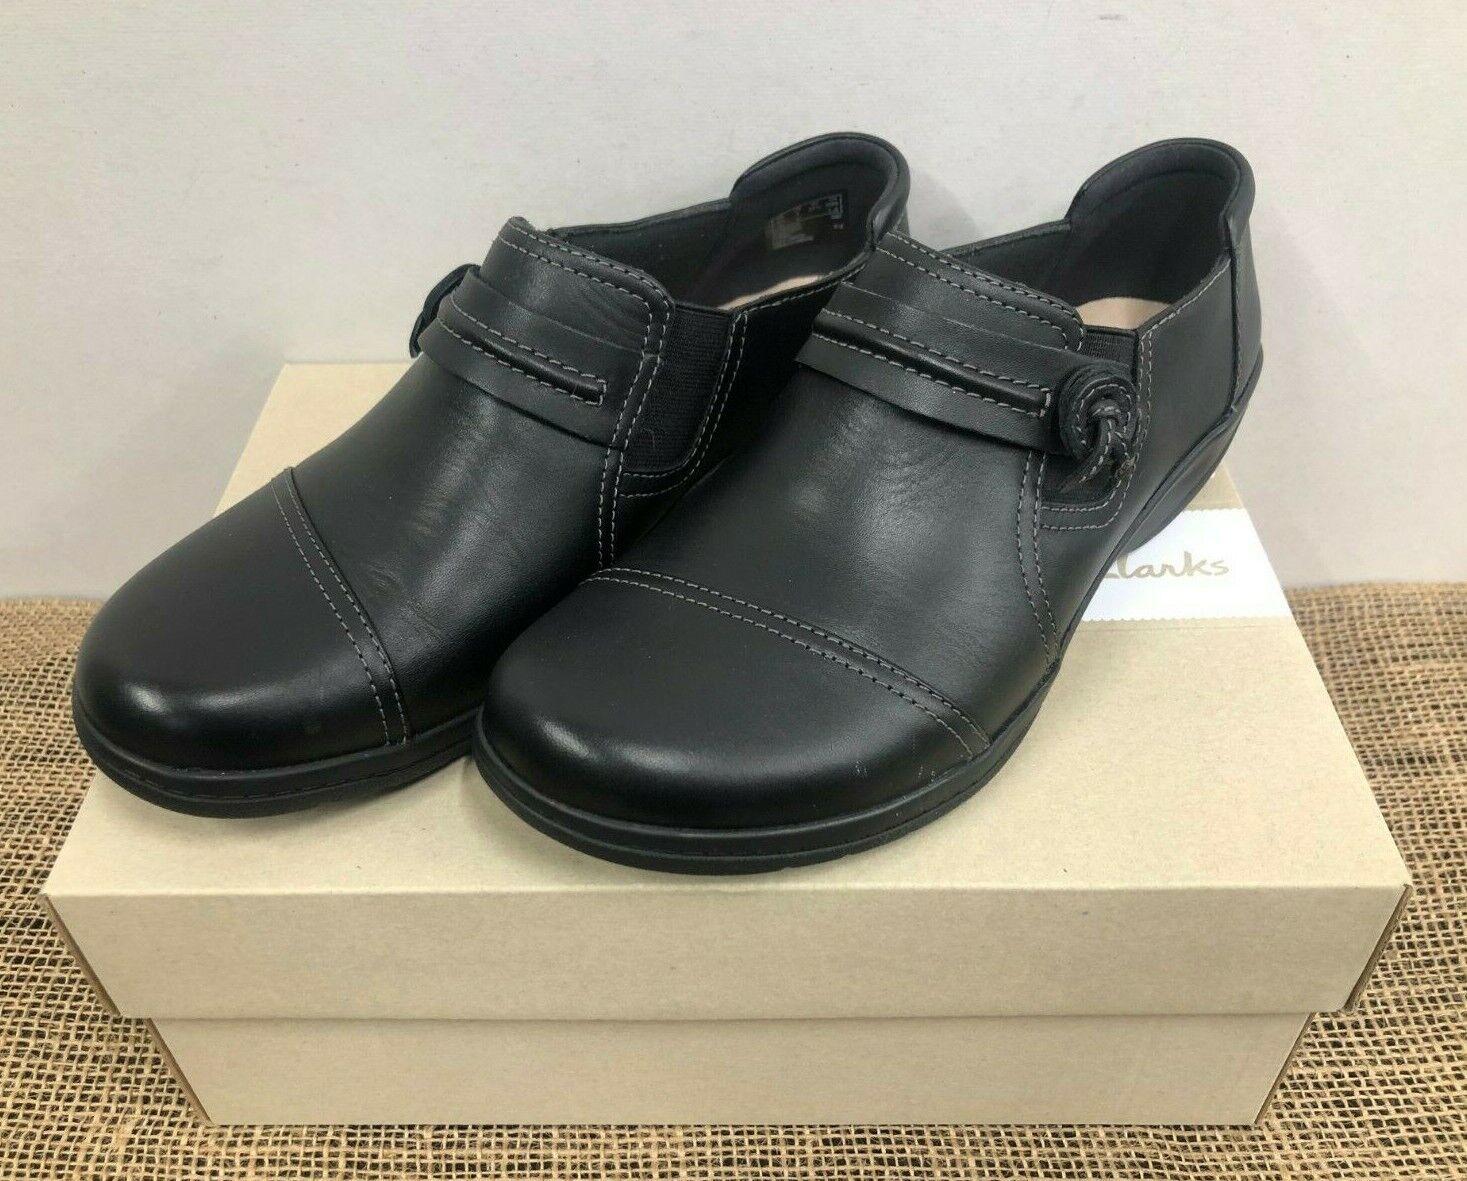 Nuevo en Caja Clarks 30609 Mujer cheyn Madi Smooth Leather Casual Zapato Negro